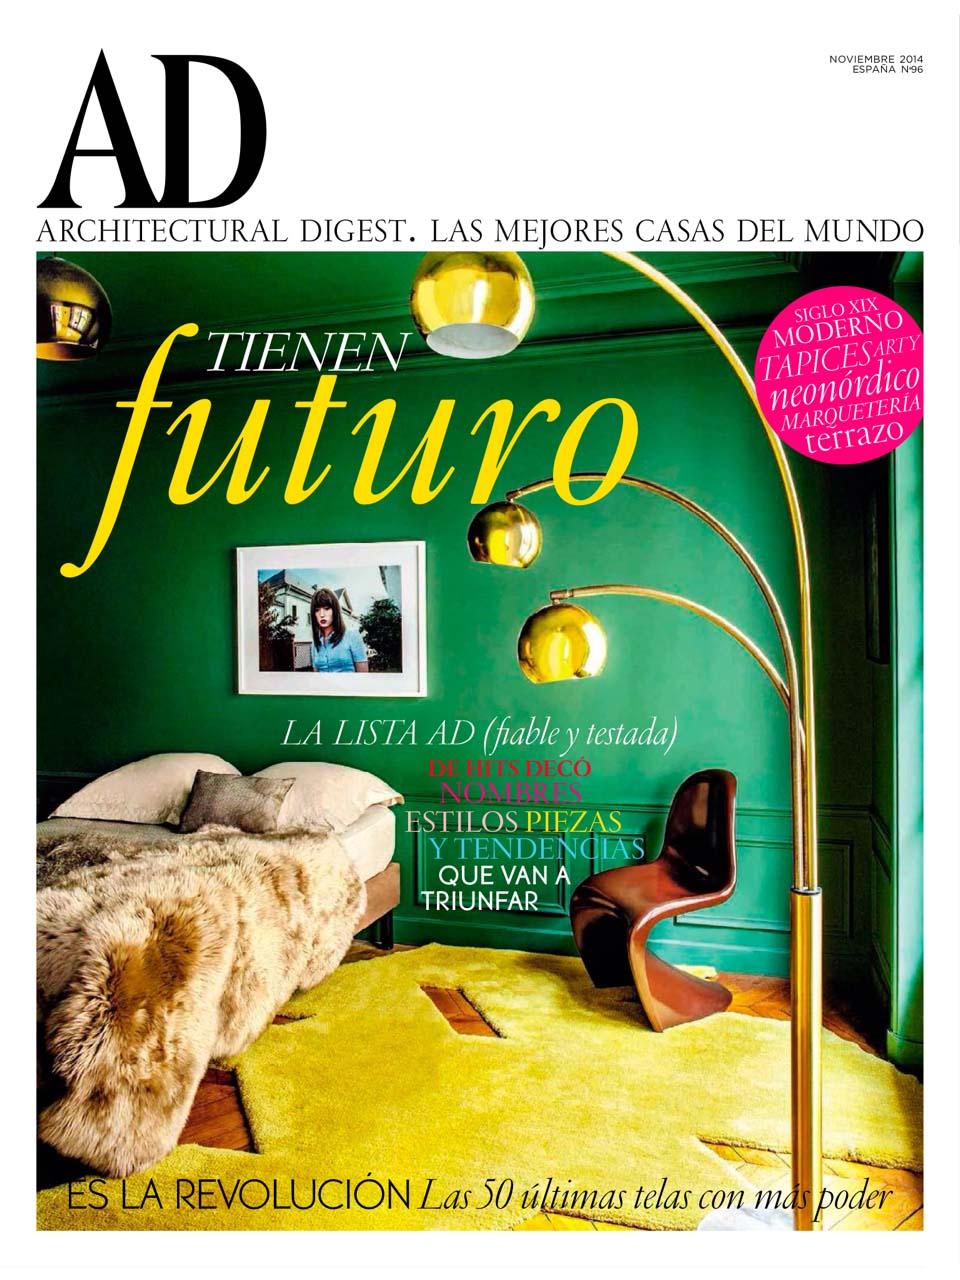 revista-ad-noviembre-2014-melian_randolph-portada-0